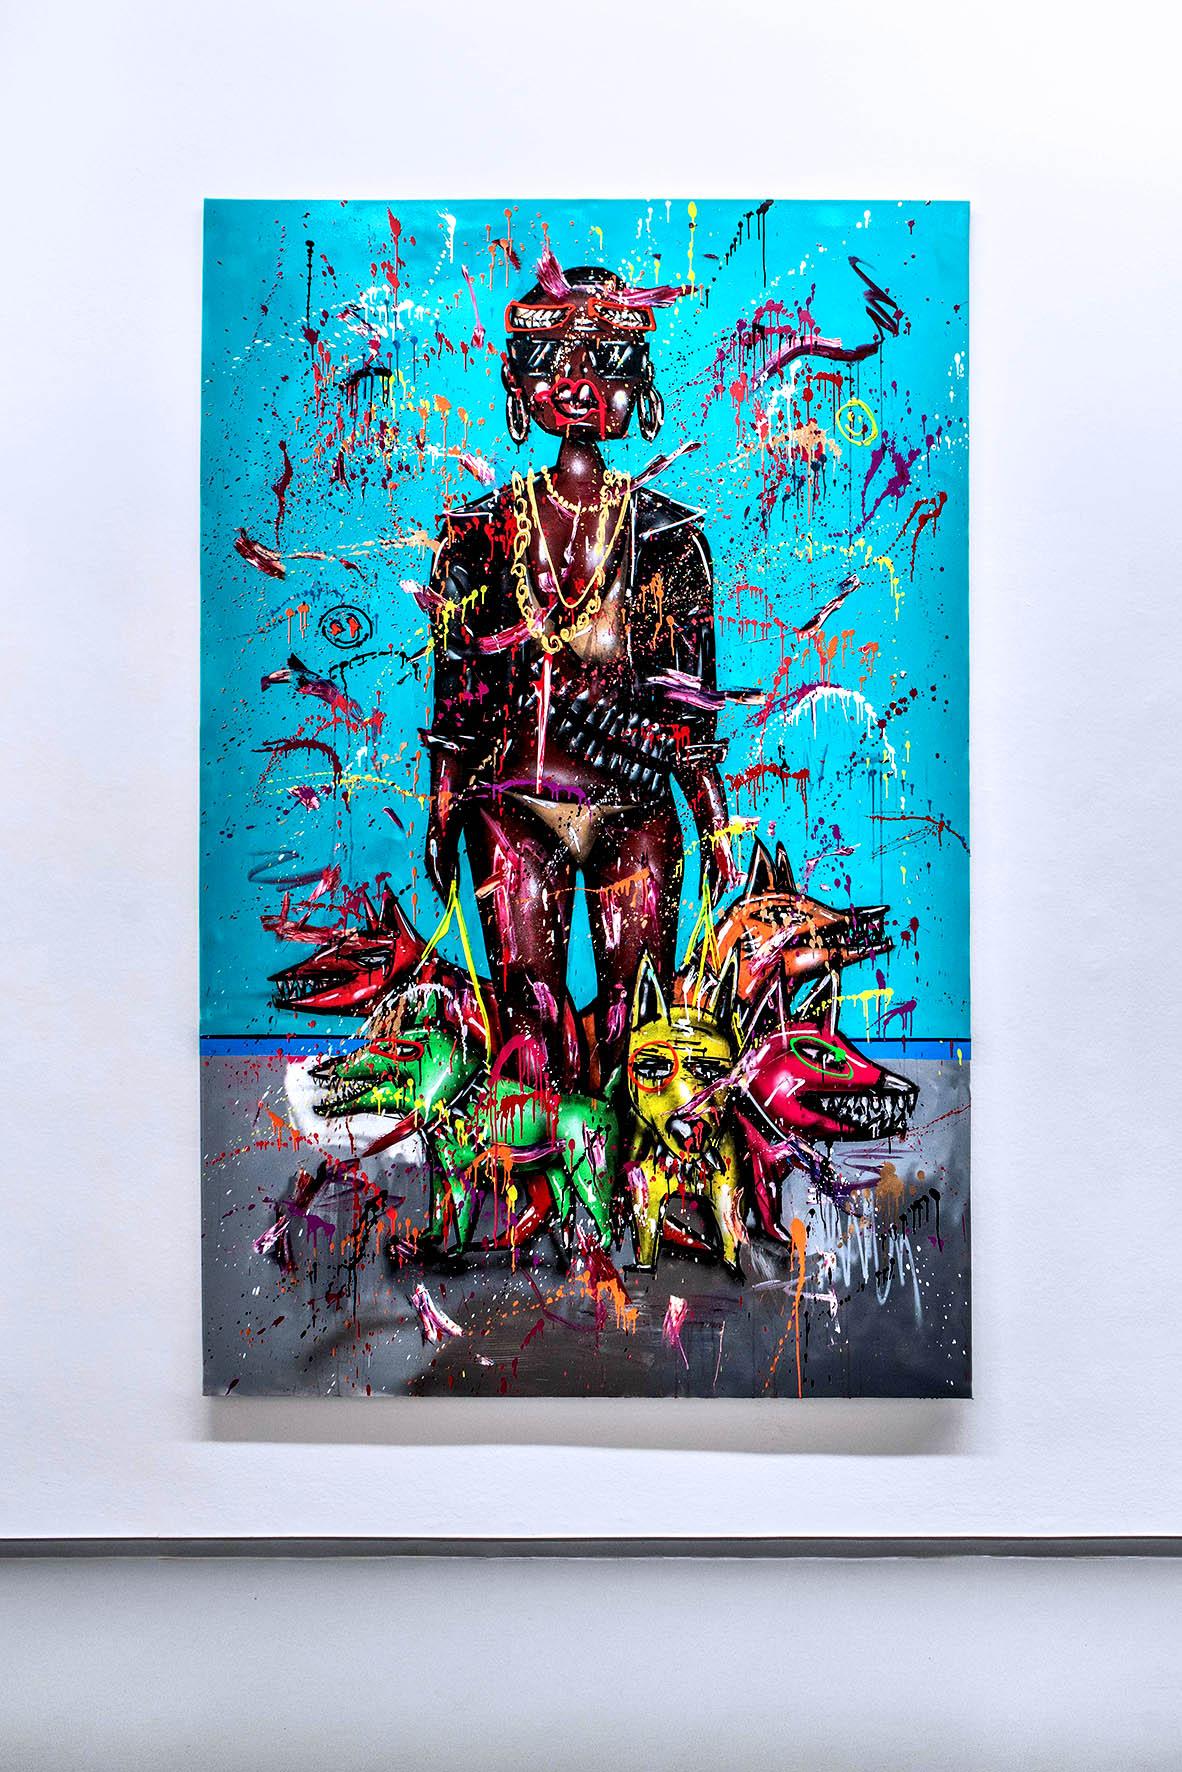 GERMANIA, 2019, mixed media on canvas, 280x180cm